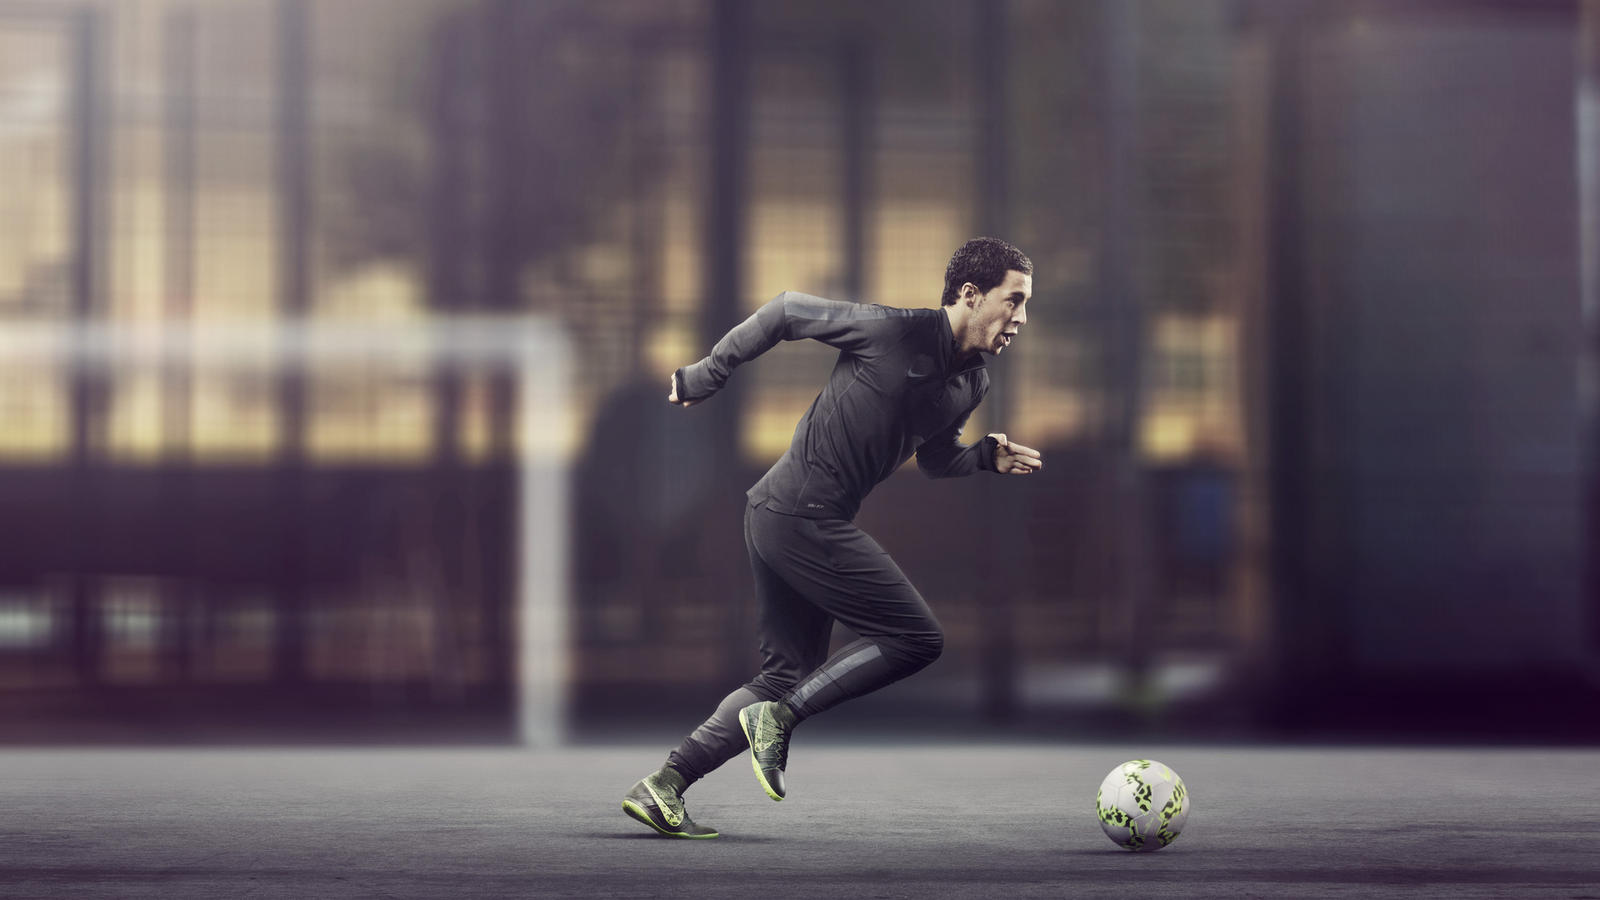 Nike | Elastico Superfly 'Mess Em Up'